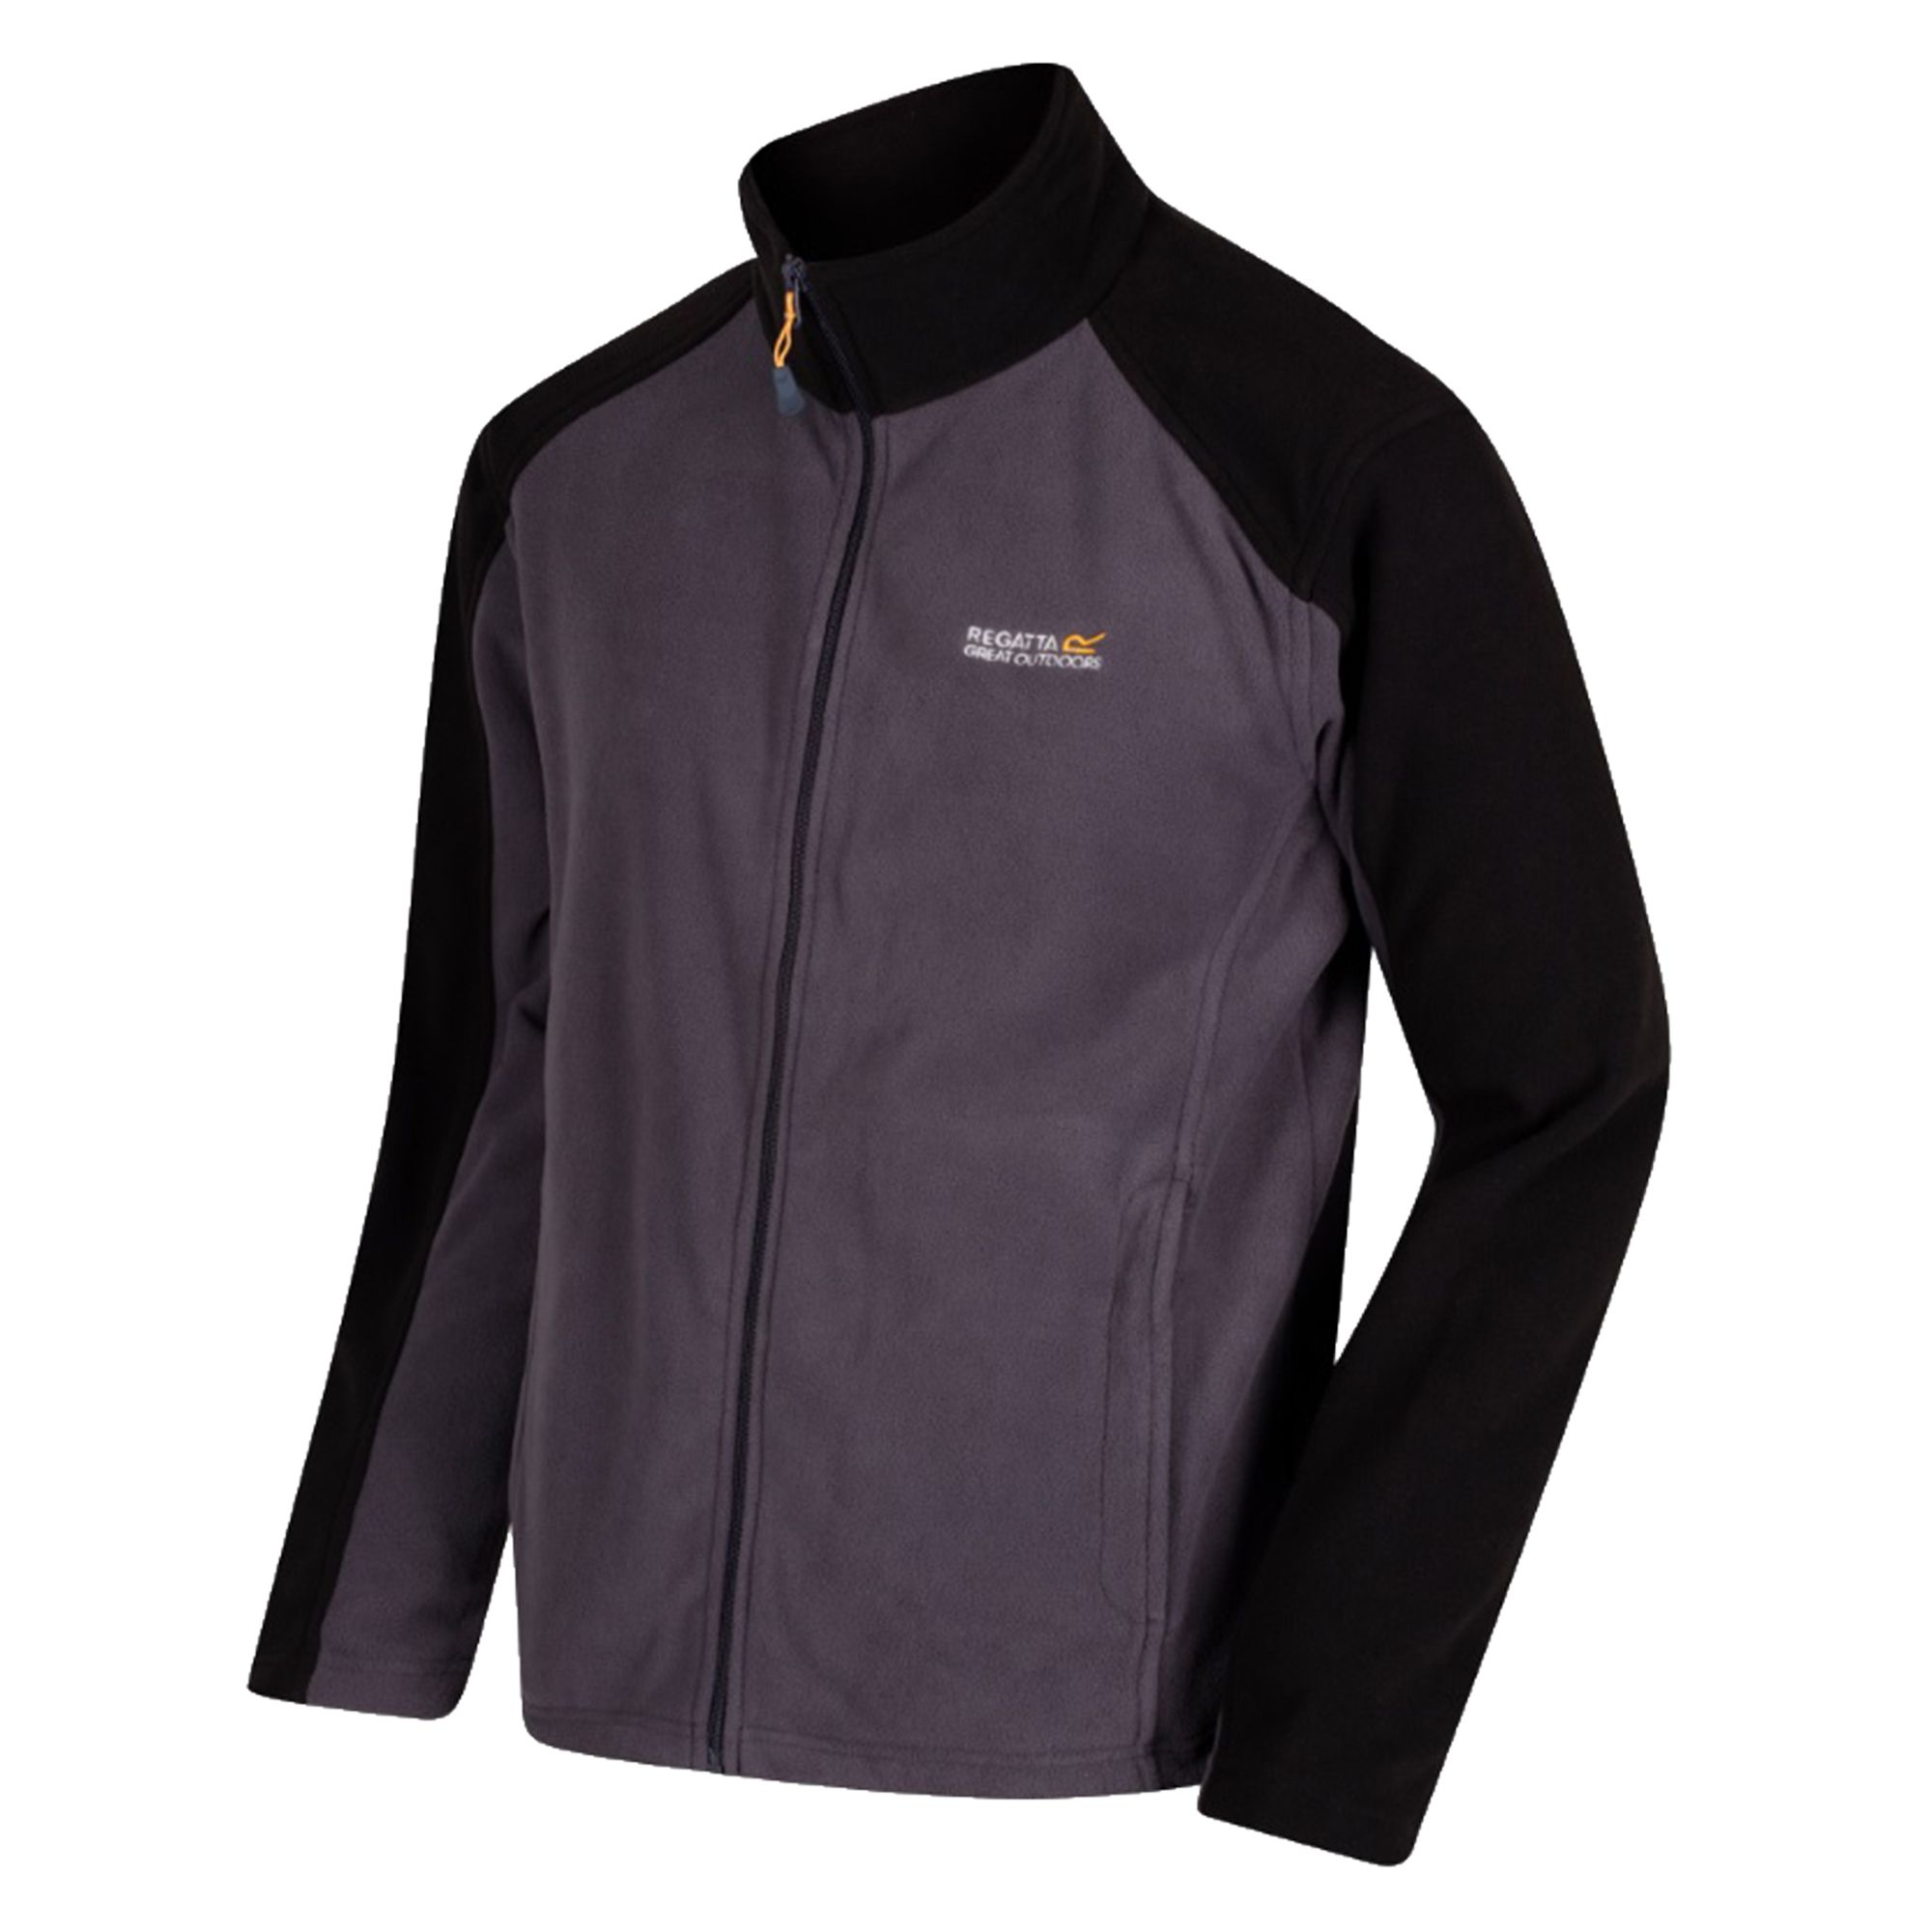 Regatta Great Outdoors Mens Hedman II Two Tone Full Zip Fleece Jacket